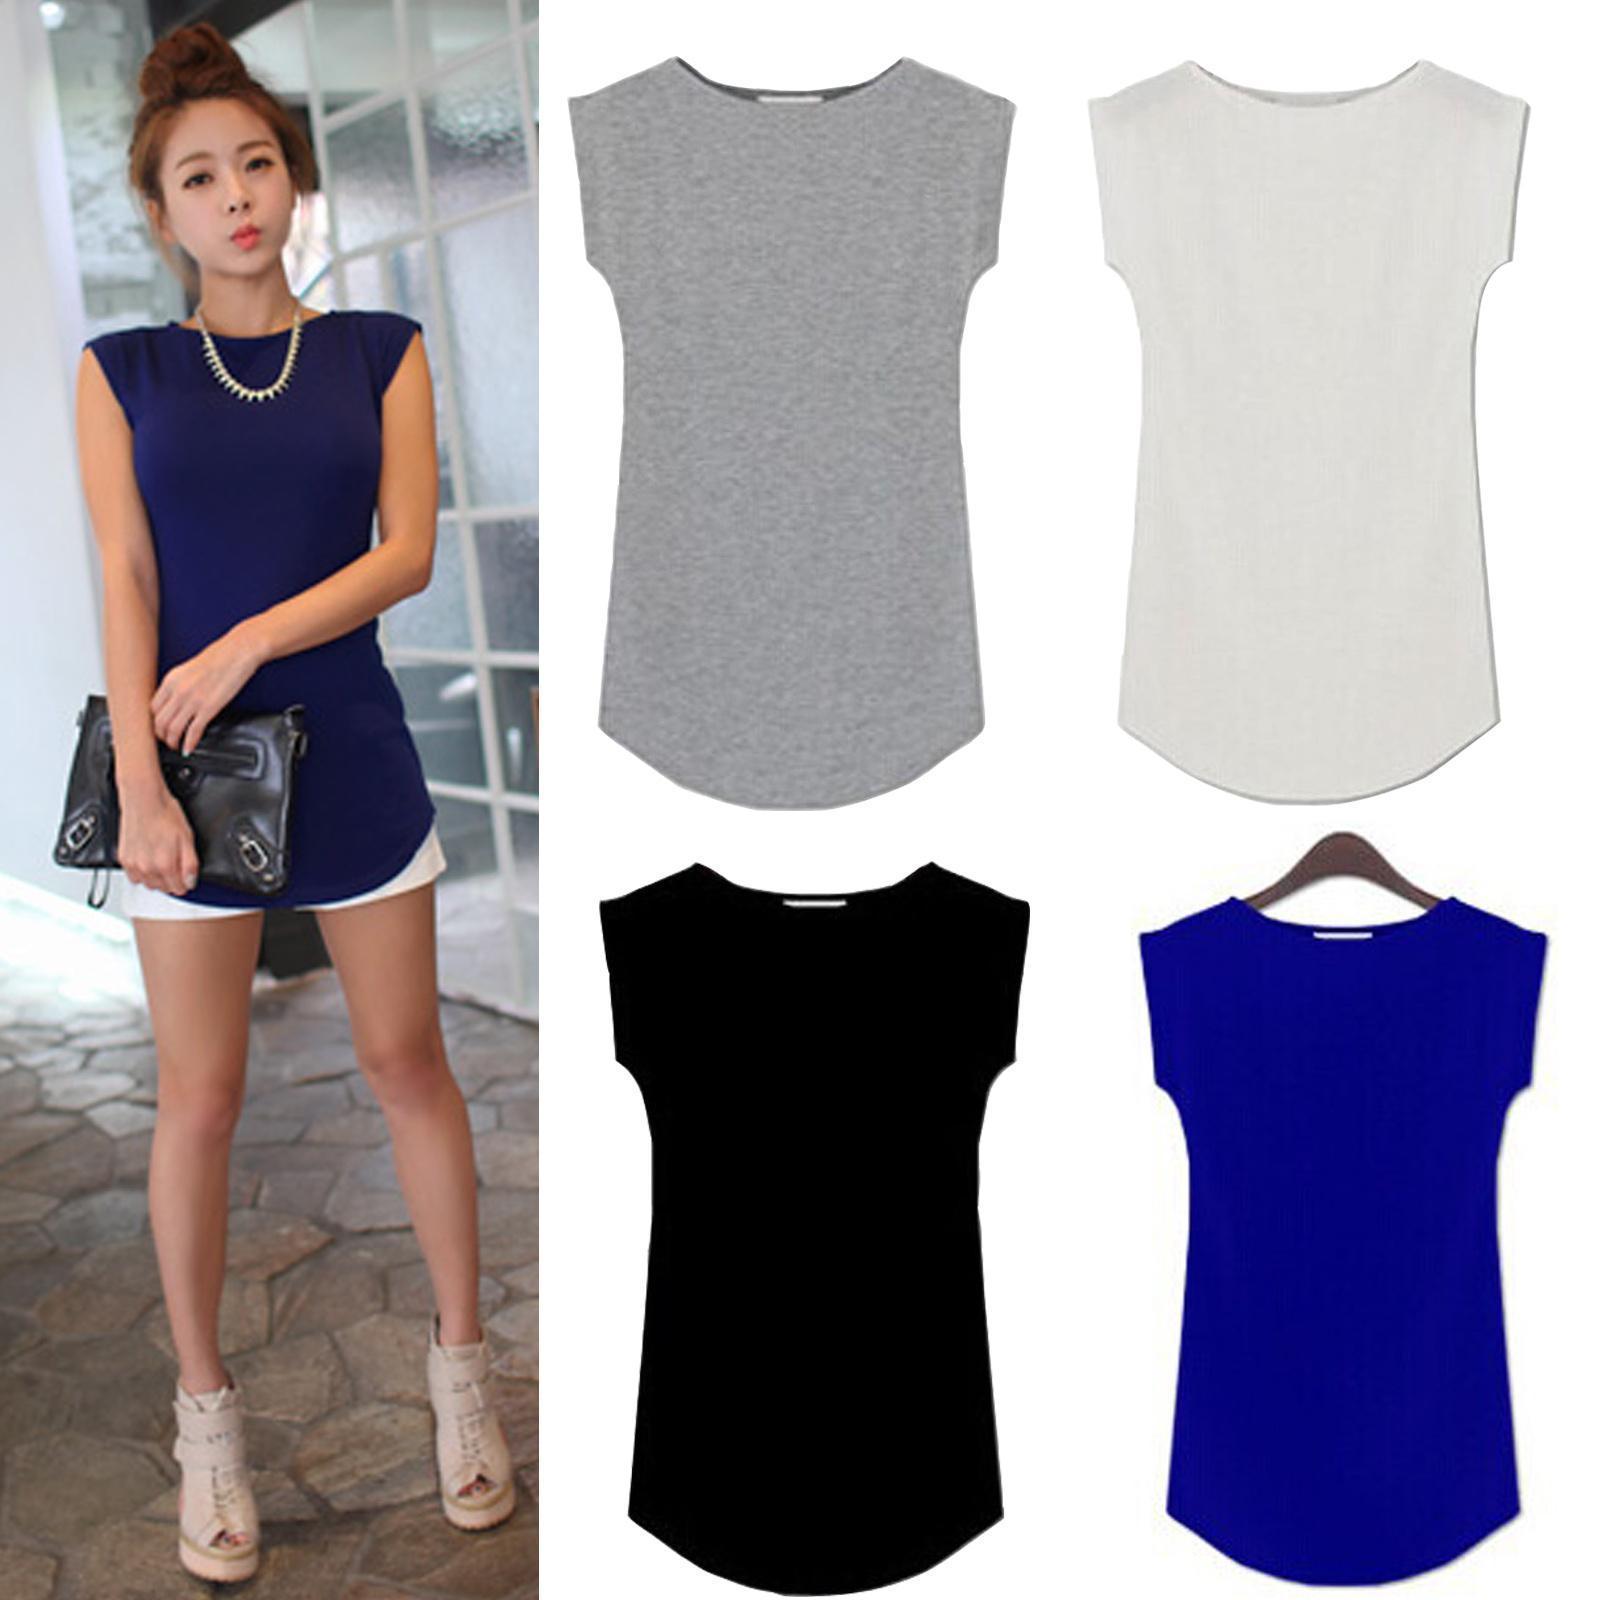 Black Friday Deals New 2018 Girls Women's O Neck Sleeveless Long T-Shirts Modal Tops Basic Solid White Black Blue Gray Tee Shirt